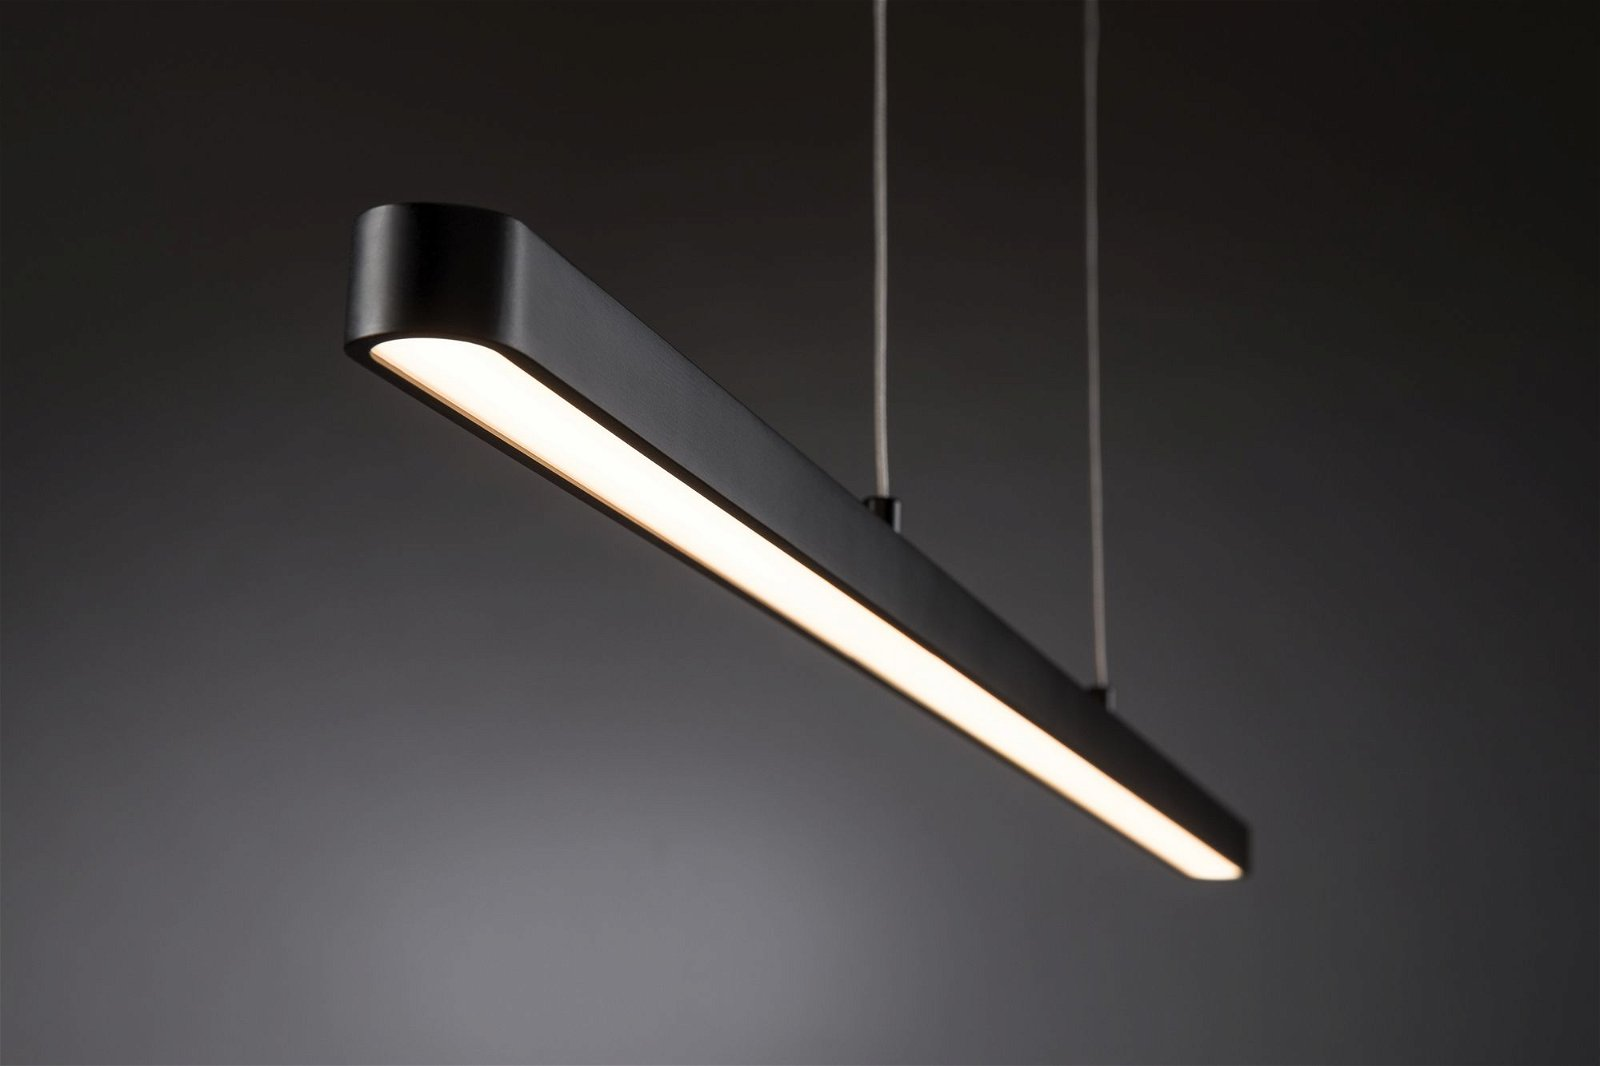 LED Pendelleuchte Lento 2700K 3495lm 42W Schwarz